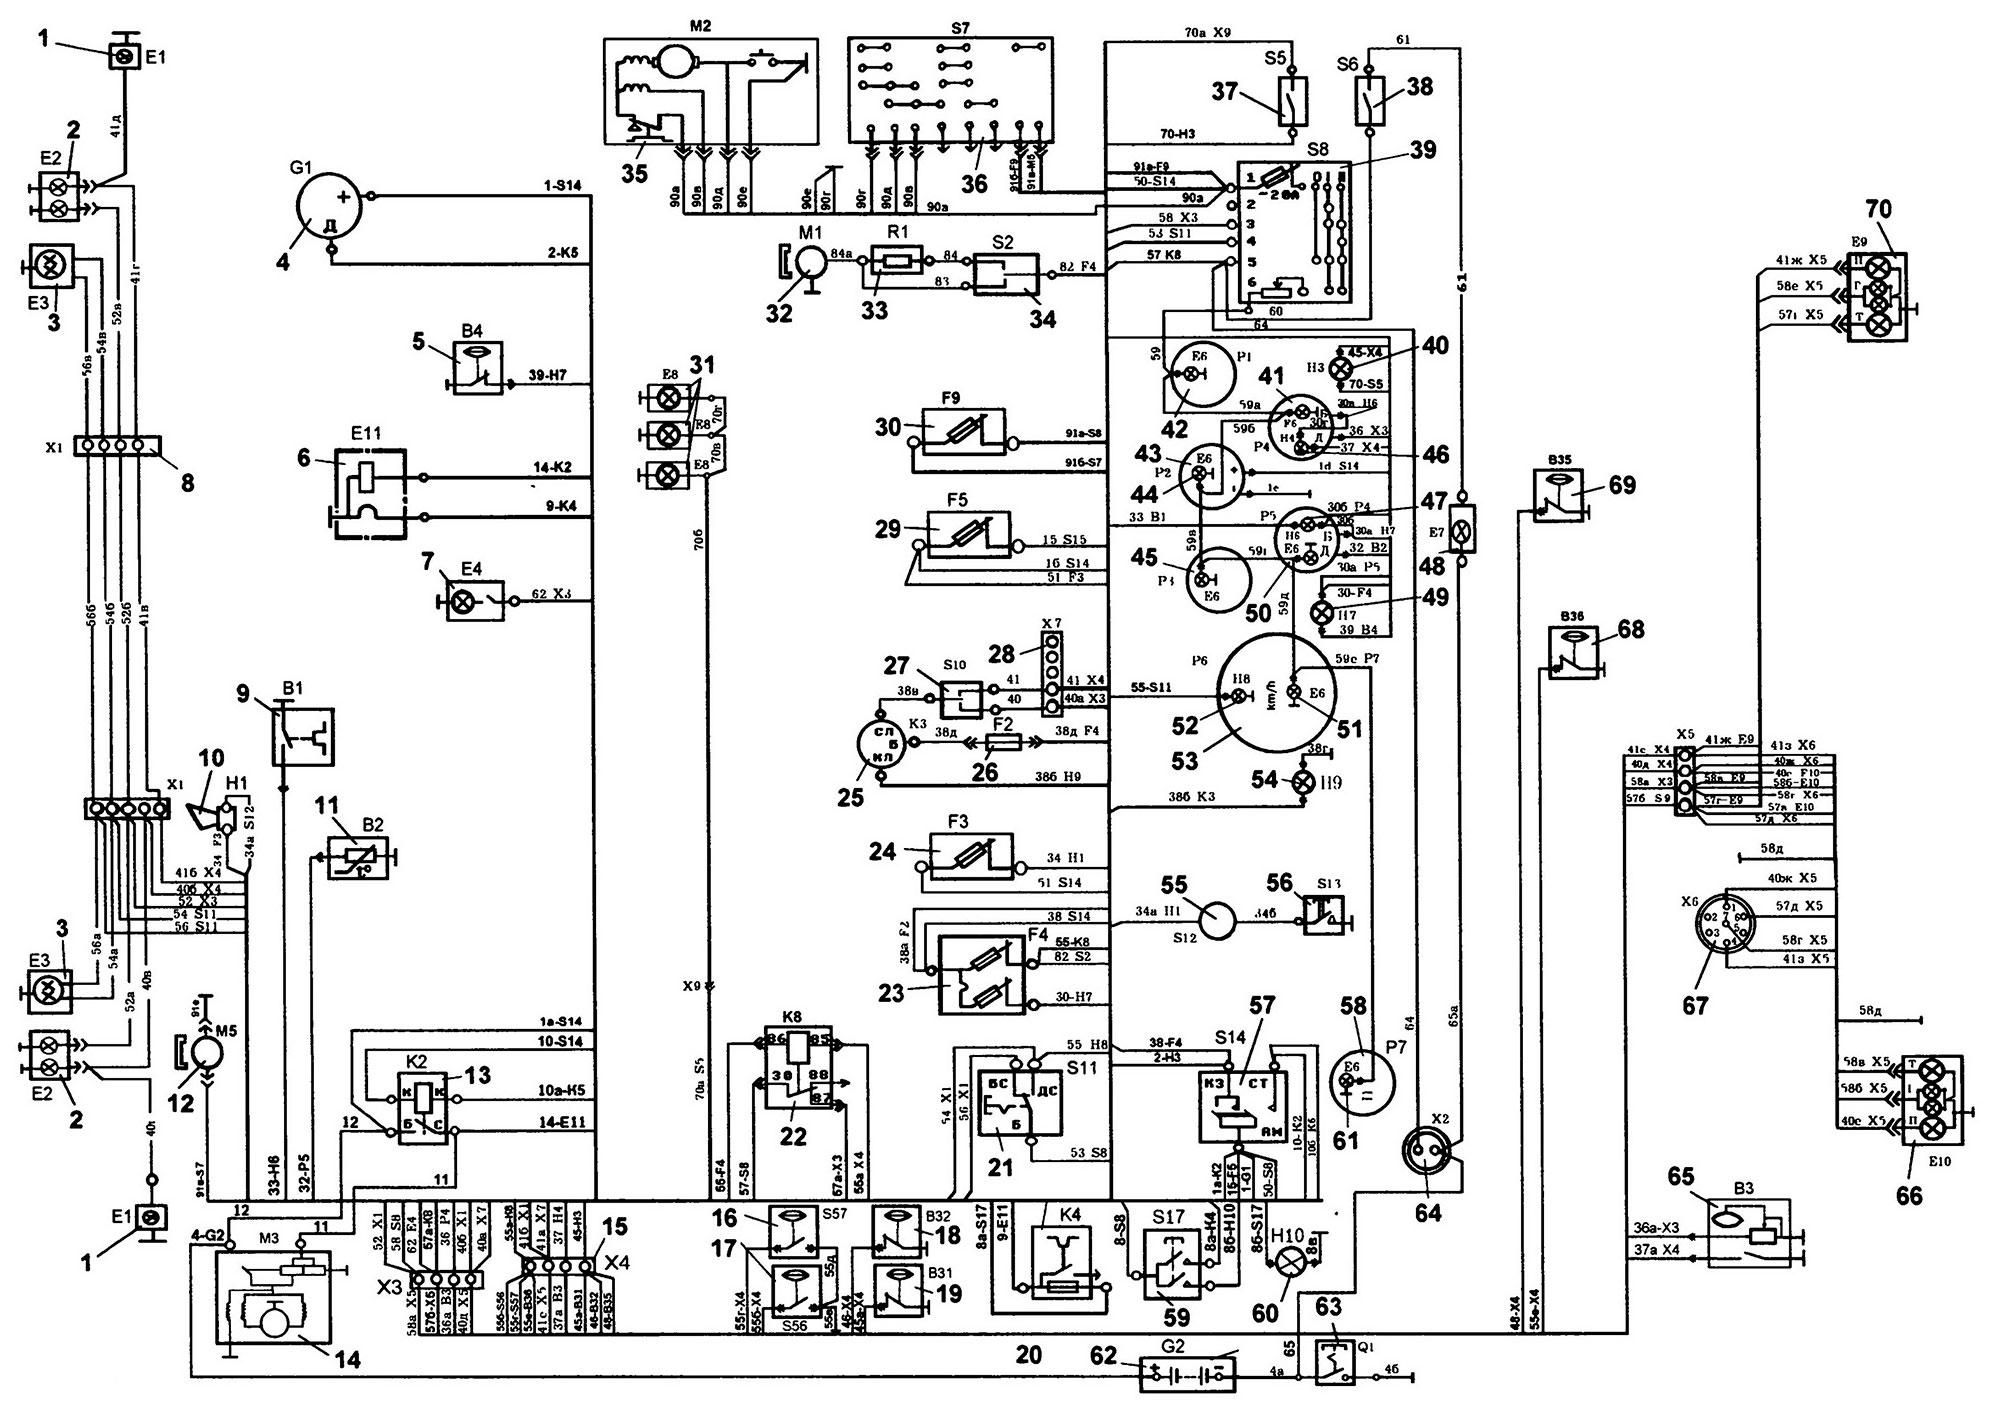 Схема электропроводки и электроники З�Л-431900